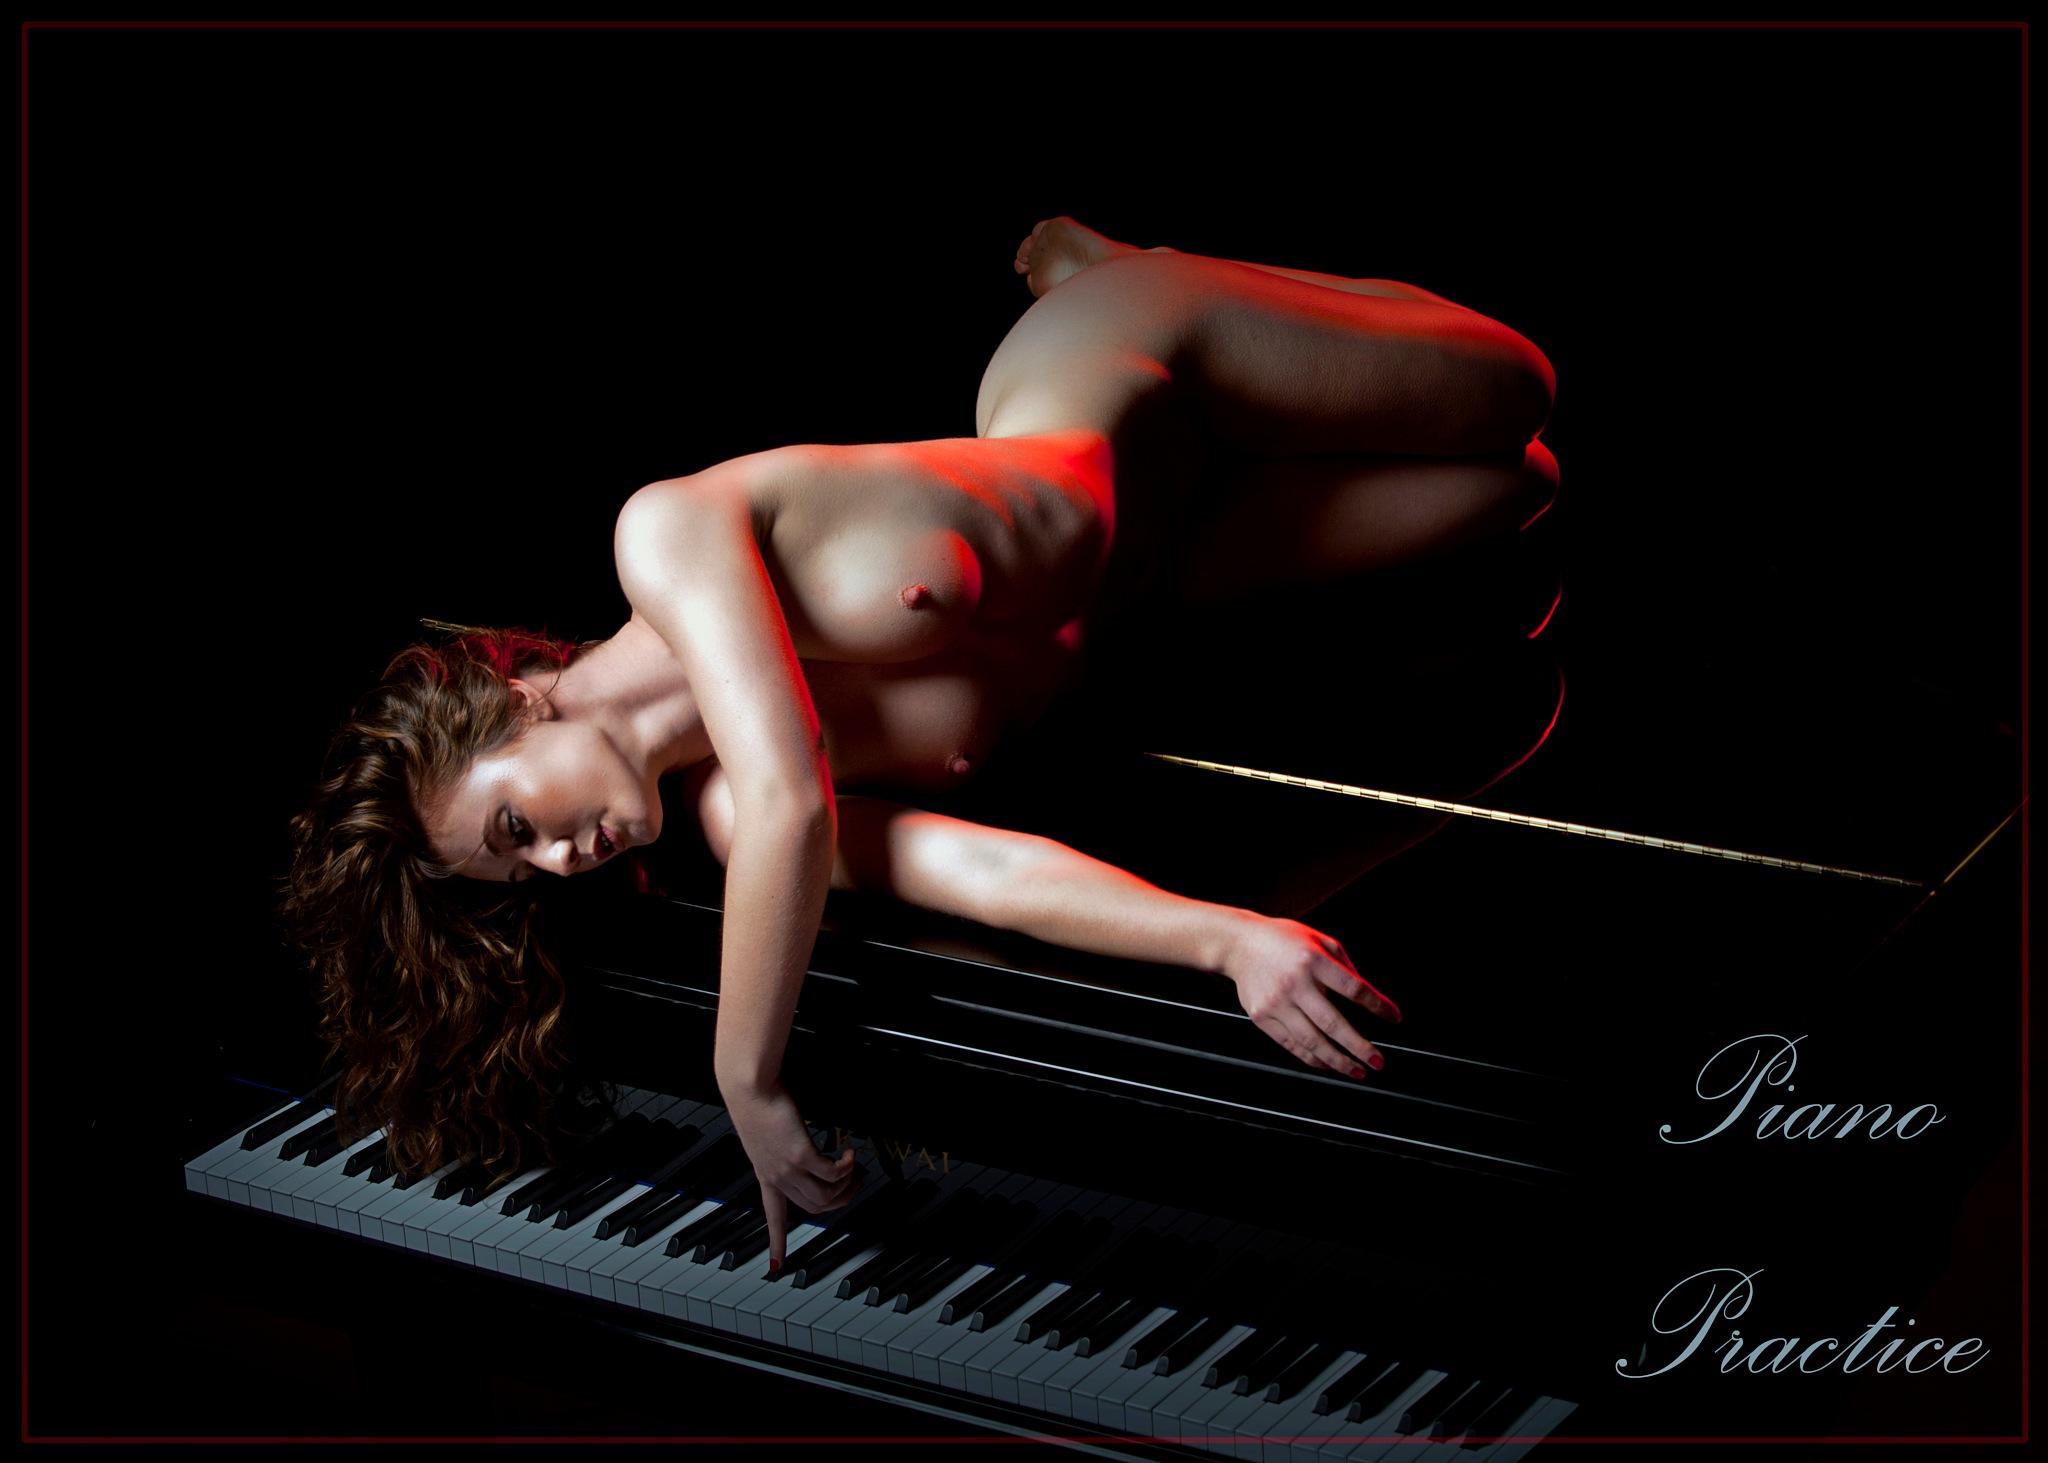 Piano Practice by Dacro